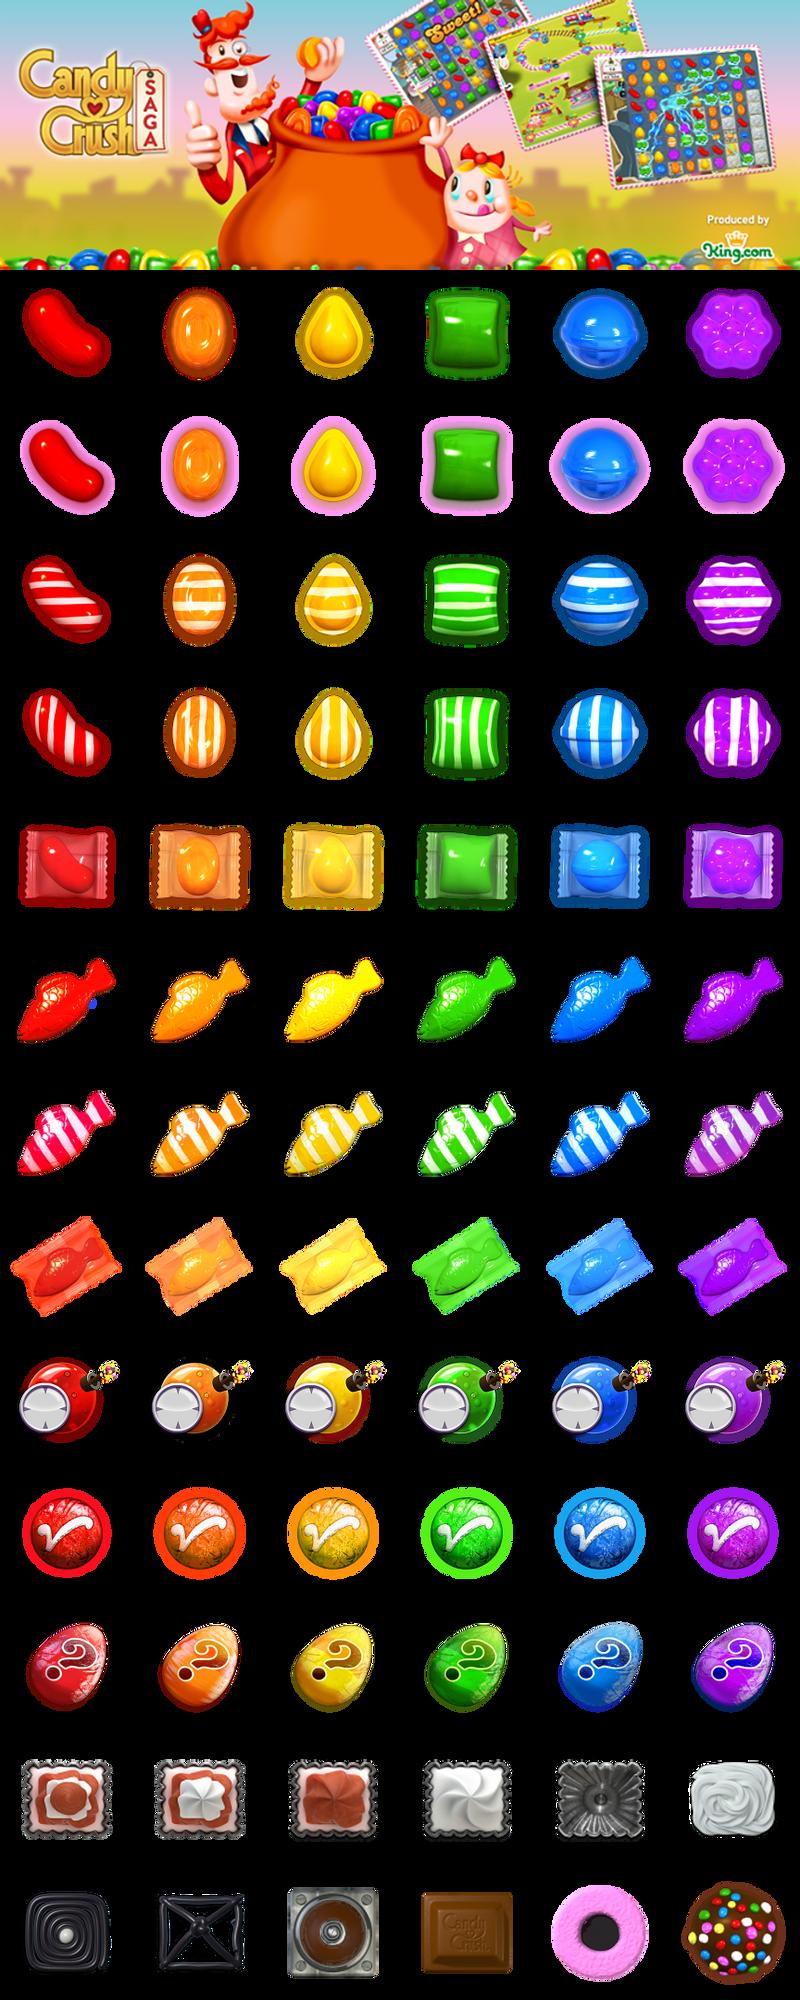 Candy crush saga p by mcsdr salem on deviantart for Candy crush fish